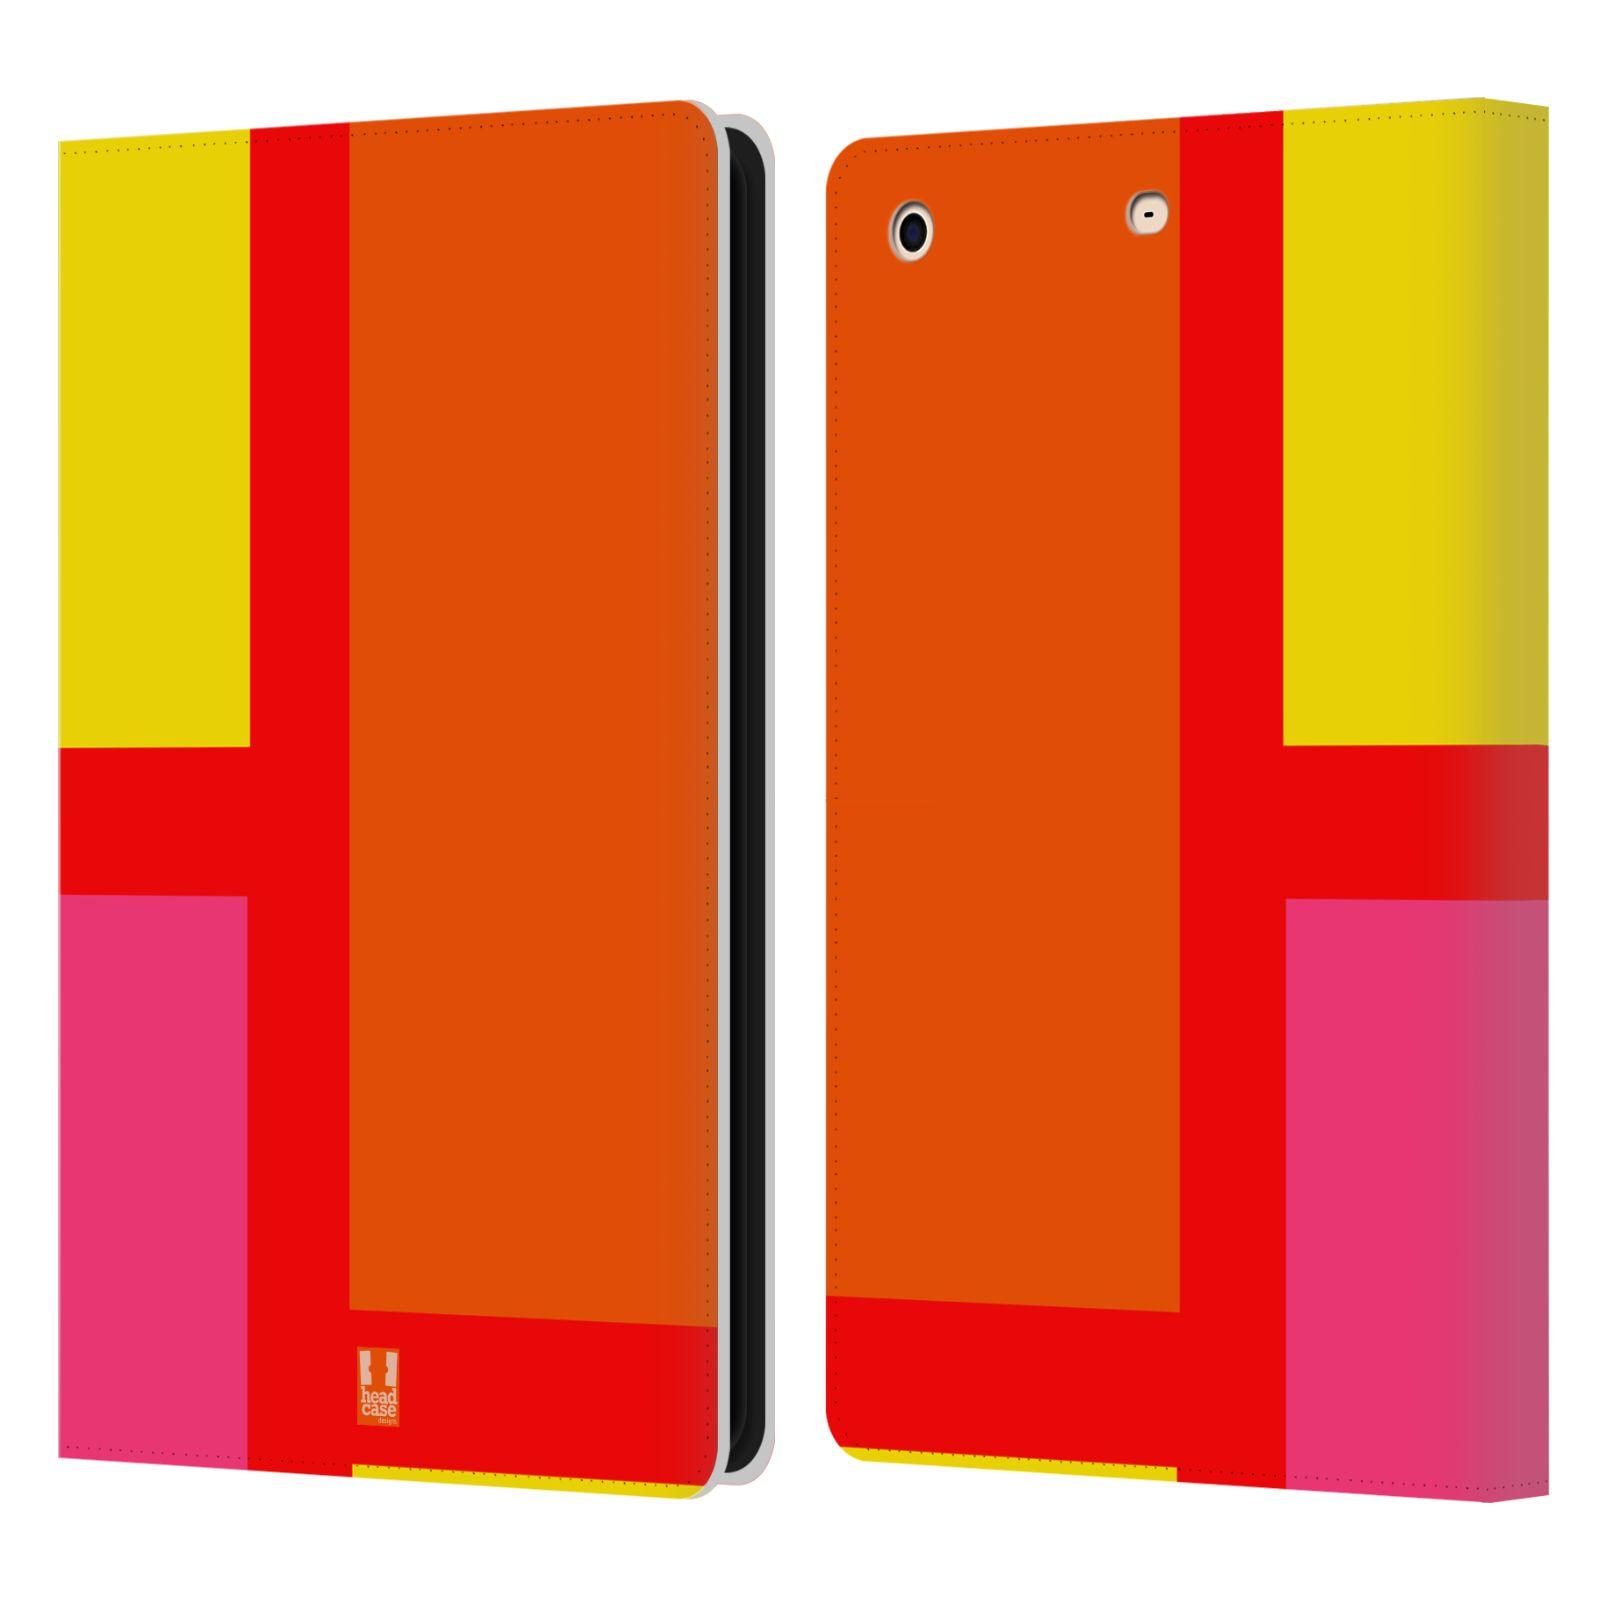 HEAD CASE Flipové pouzdro pro tablet Apple iPad mini barevné tvary oranžová ulice